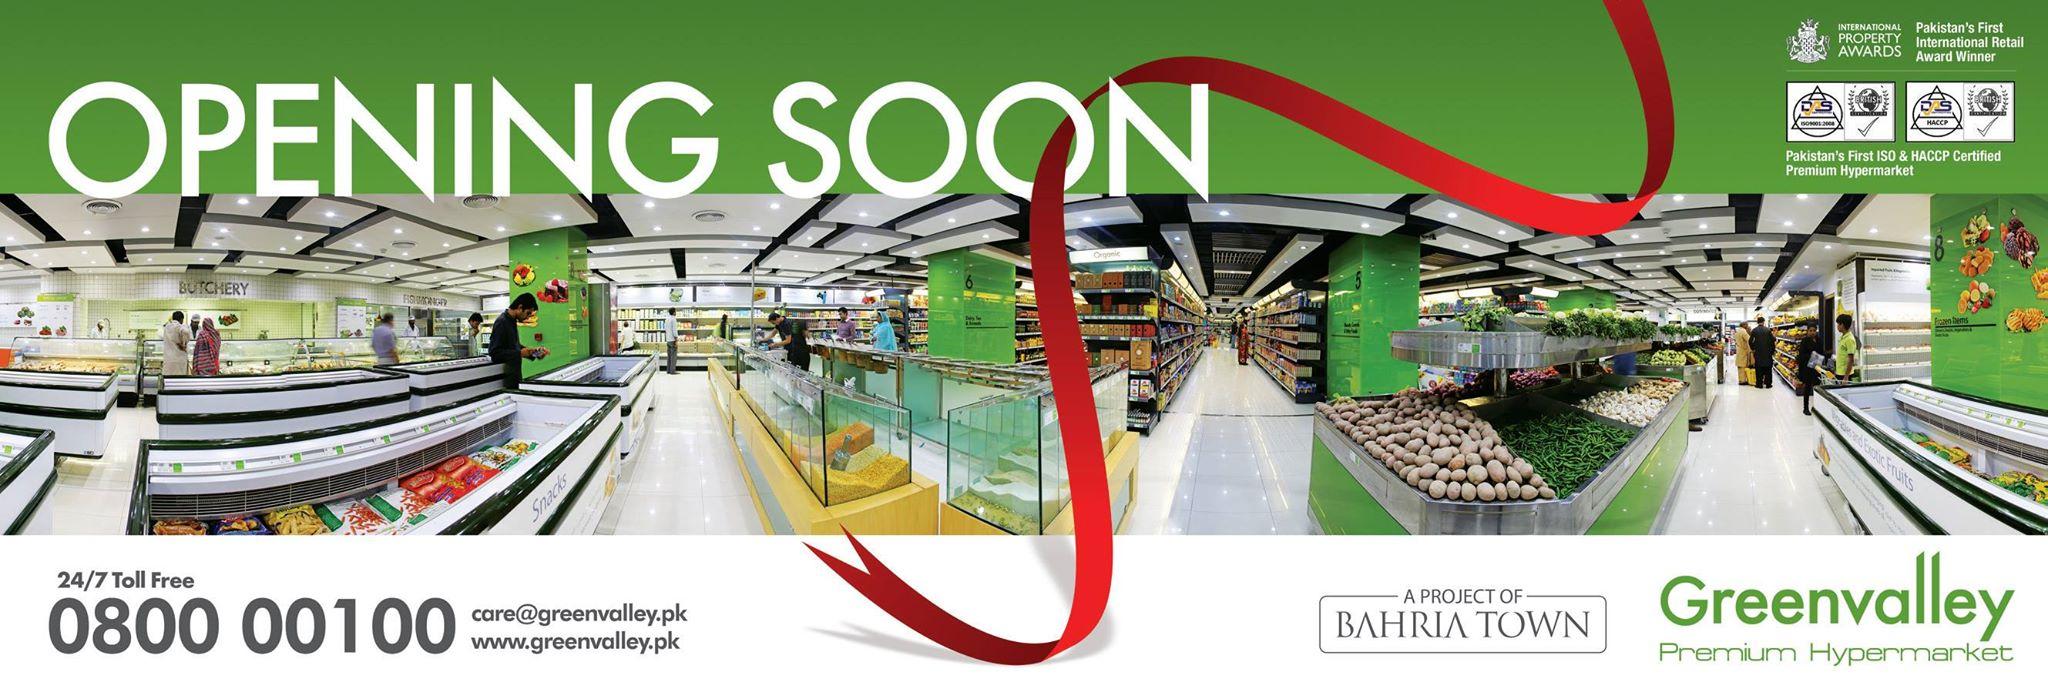 GreenValley – Pakistan's Premium Hypermarket Opening Soon in Bahria Town Karachi